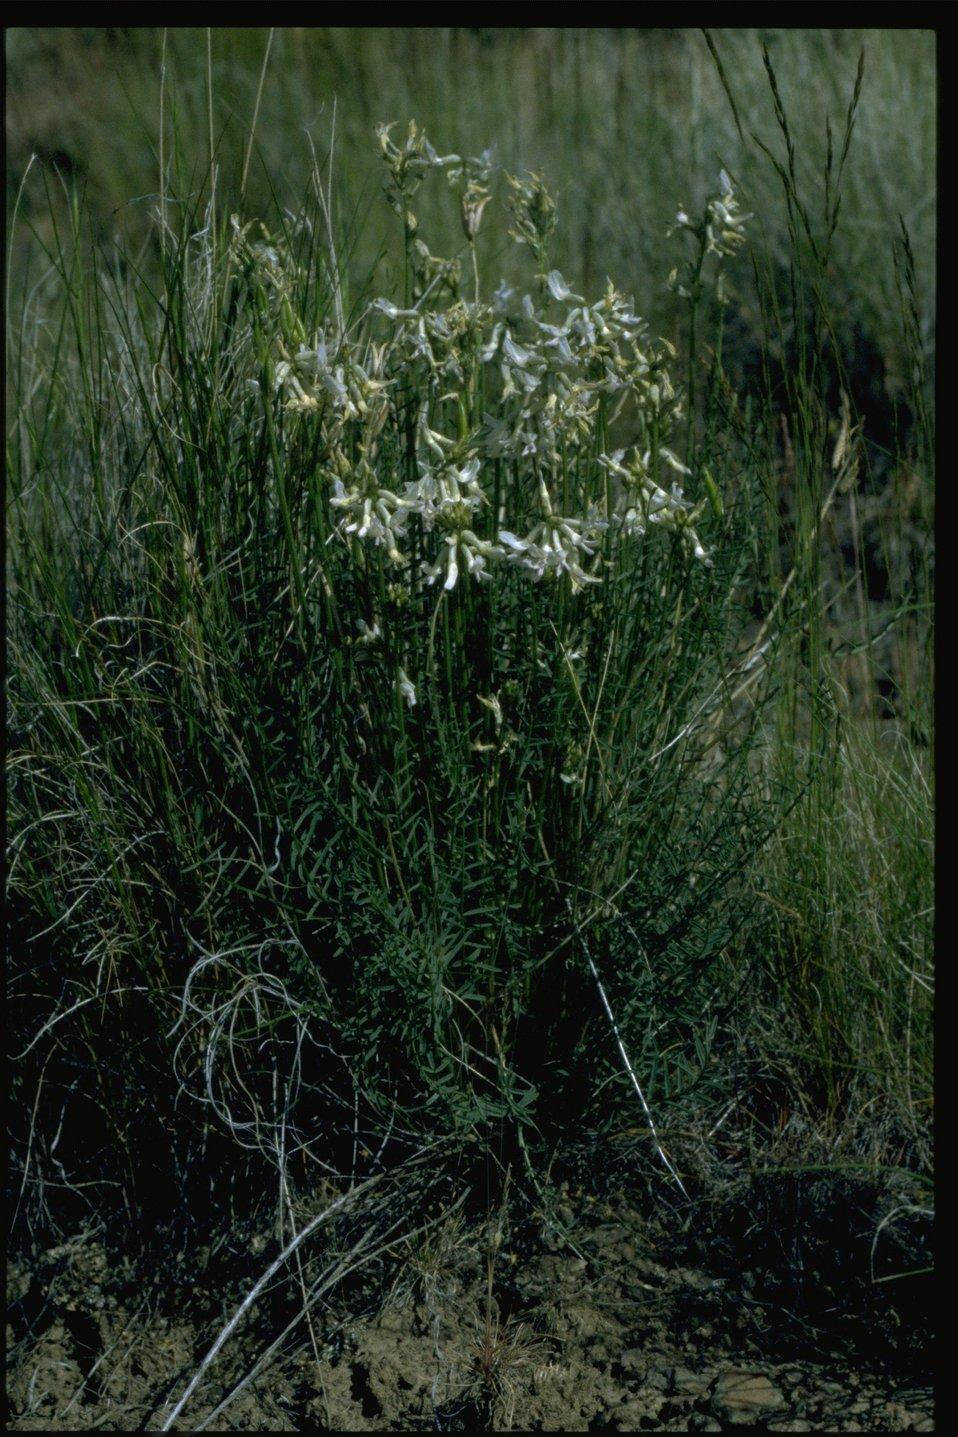 Farshot of Idaho milkvetch (Astragalus conjunctus).